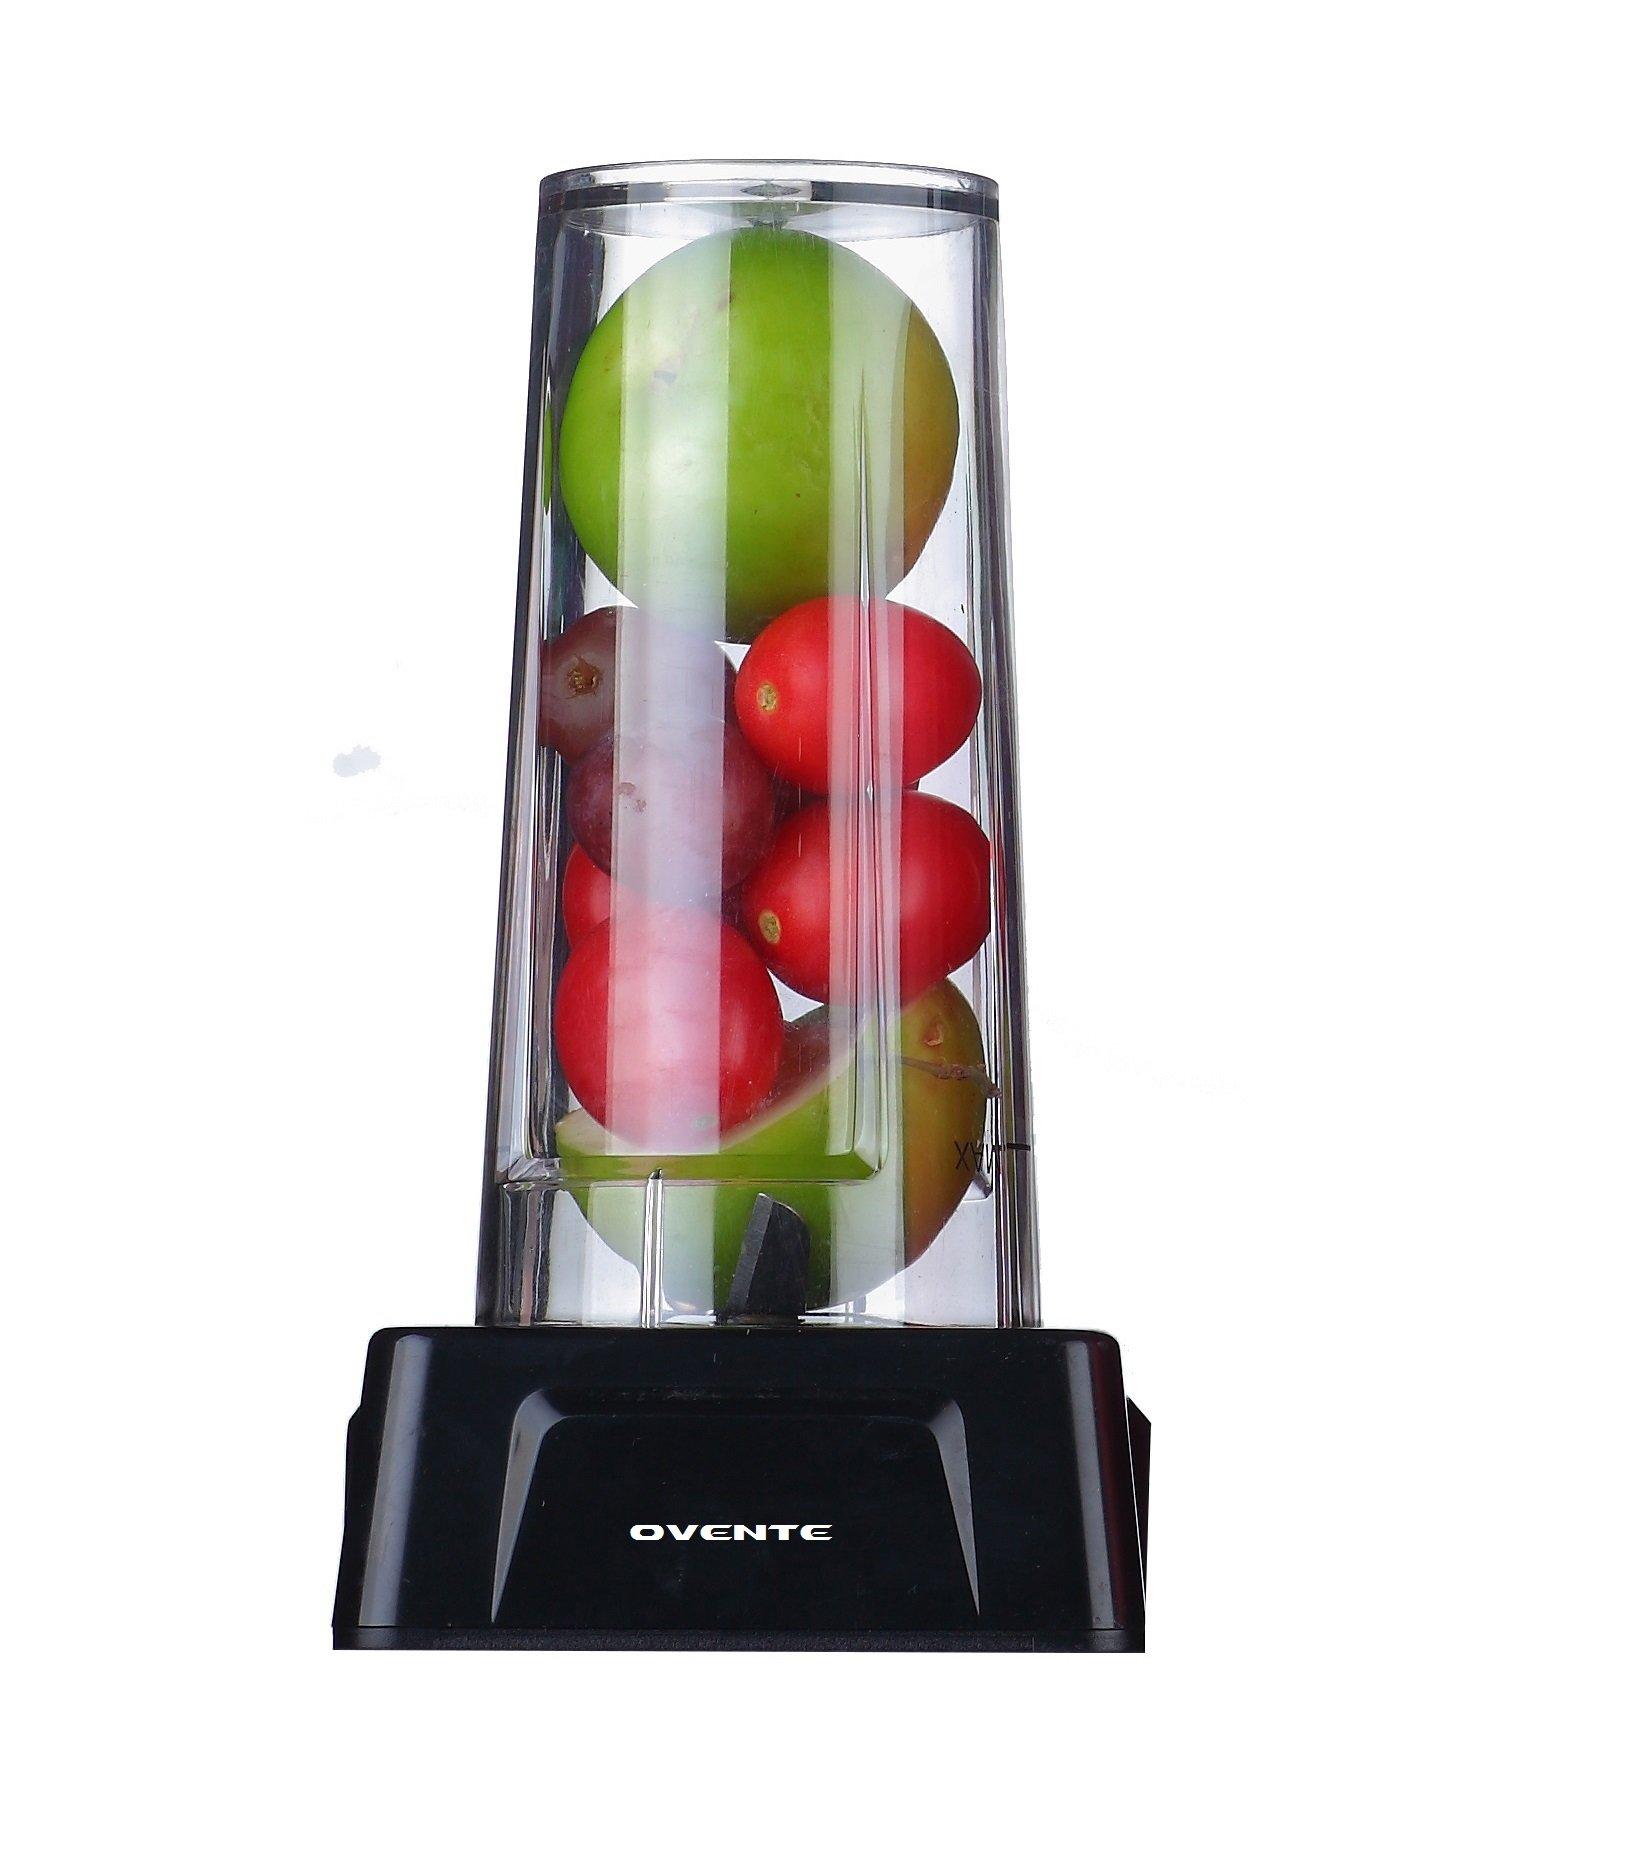 Ovente BLH1000 2-Cup Tritan Replacement Blender Tumbler Size, 14 oz